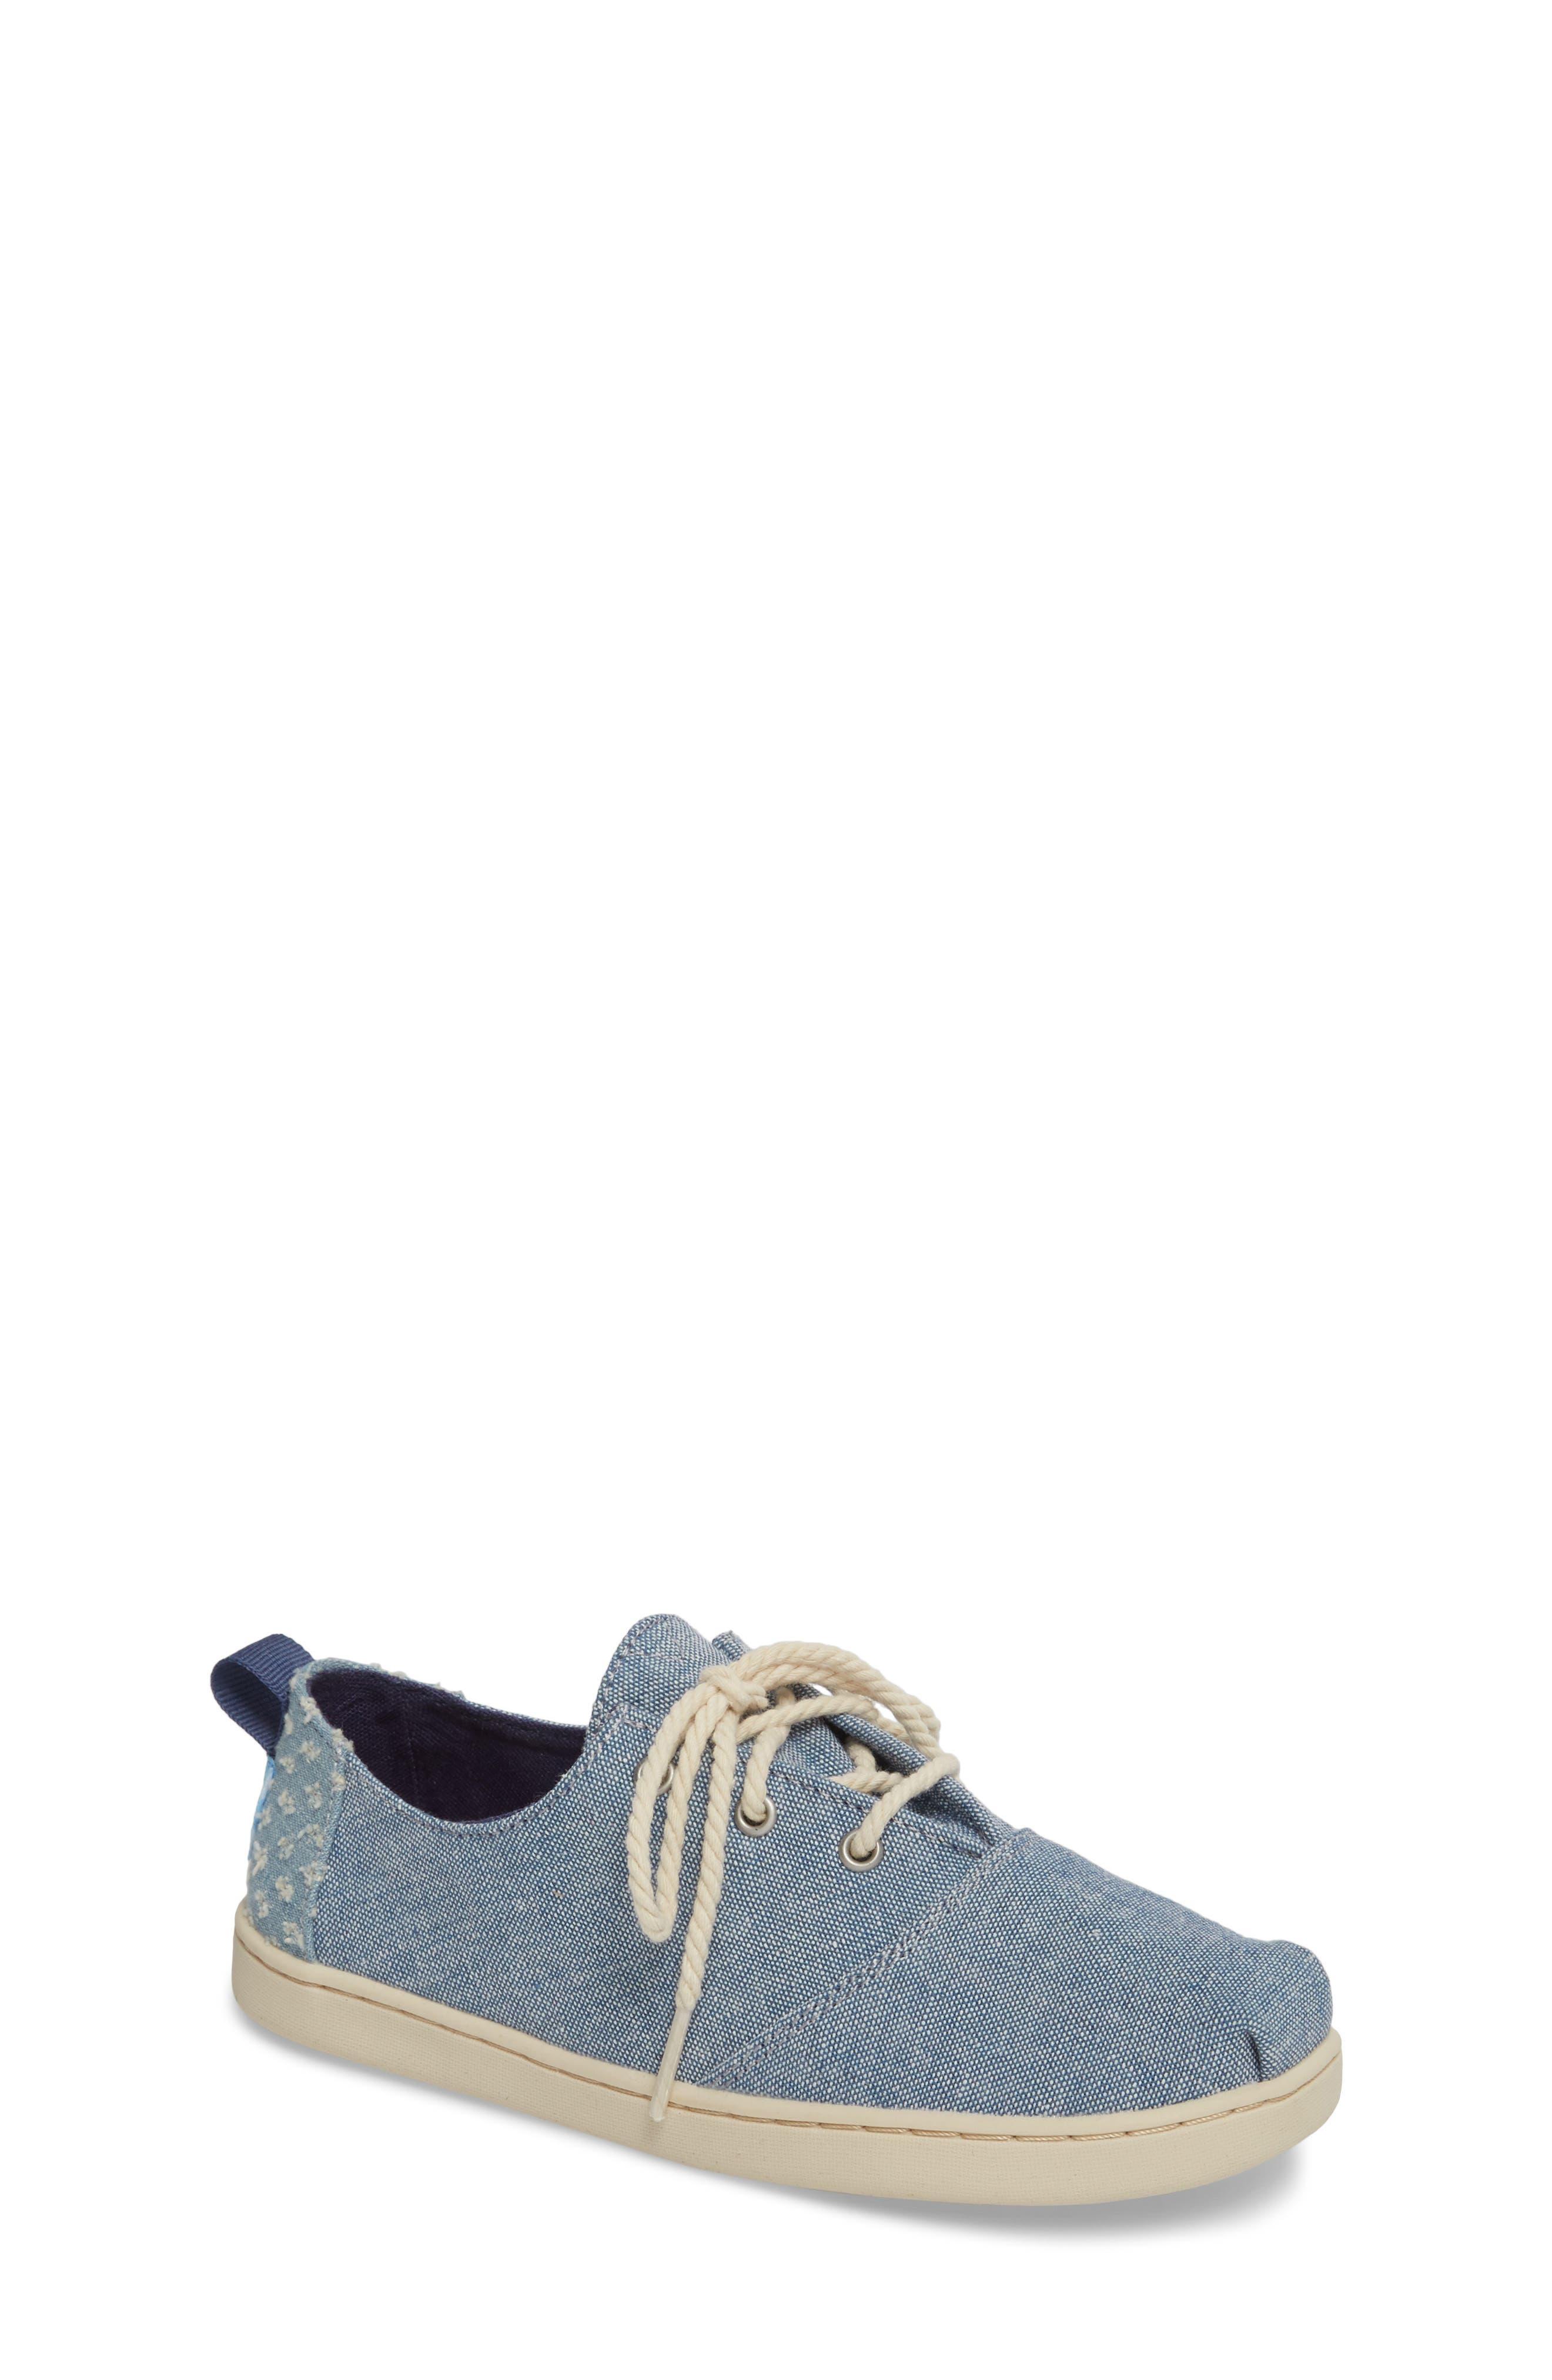 Lumin Sneaker,                         Main,                         color, Blue Chambray